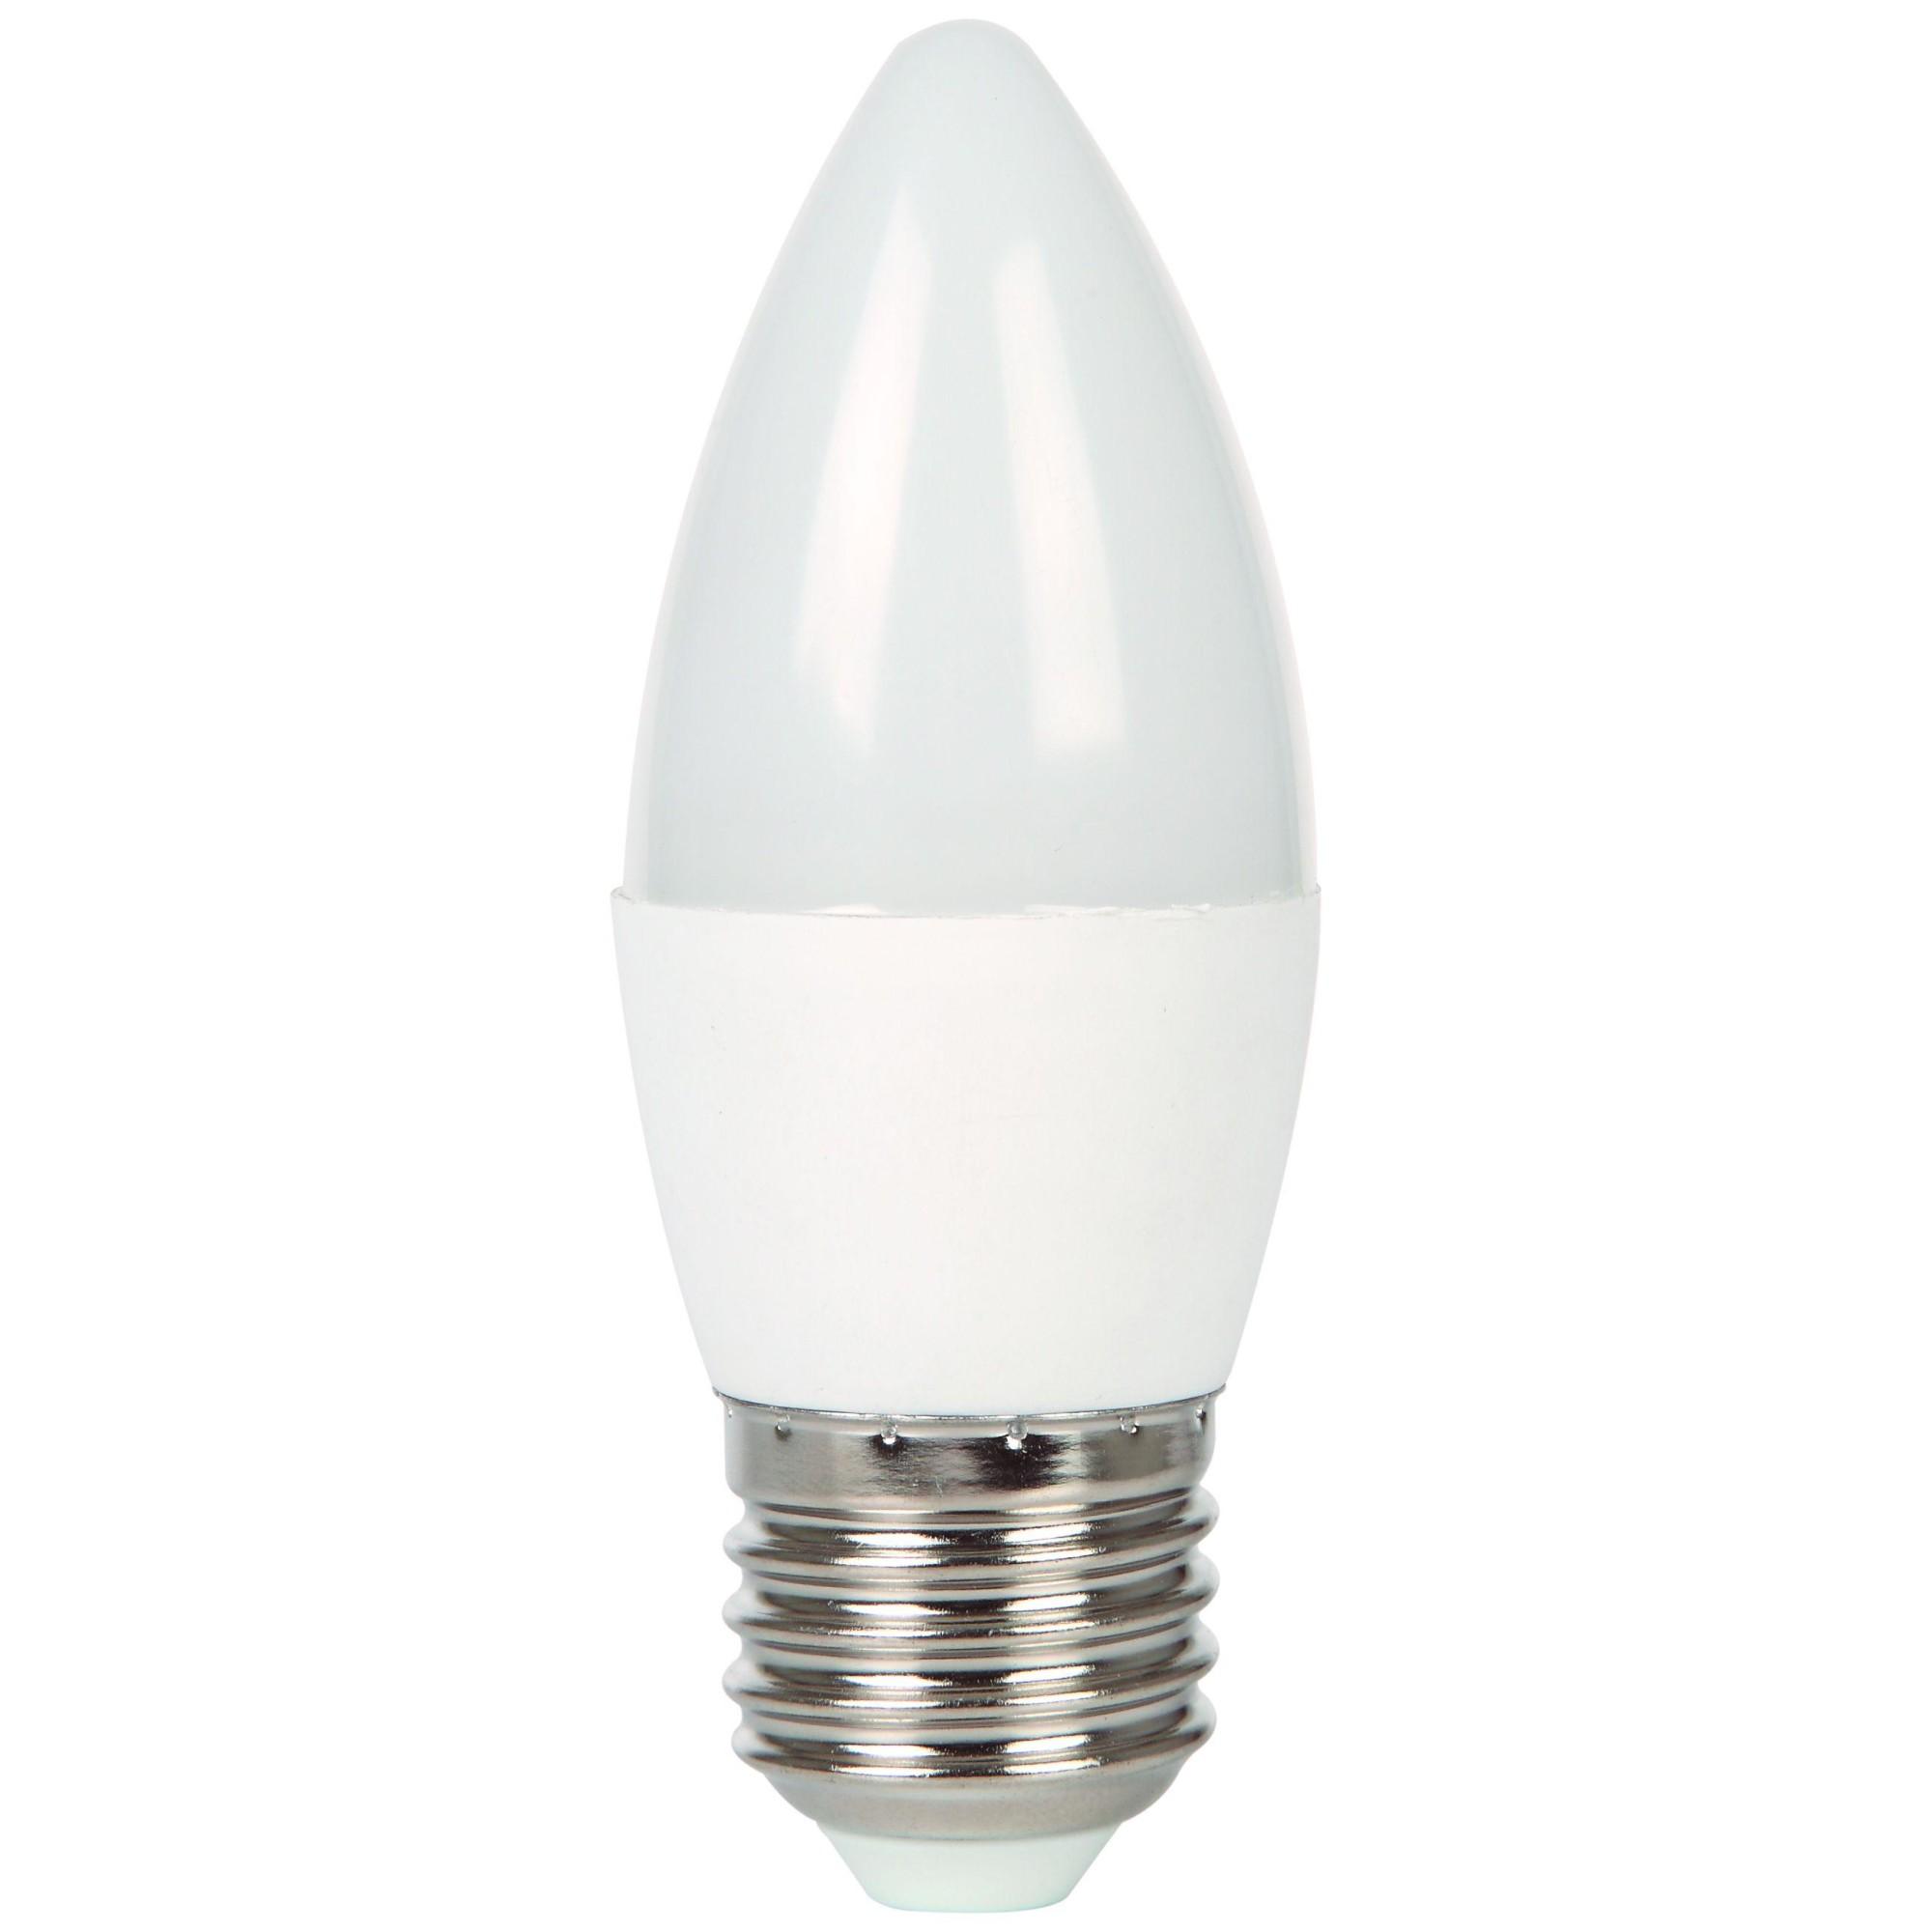 Лампа Ecola стандарт светодионая E27 7 Вт свеча 560 Лм теплый свет